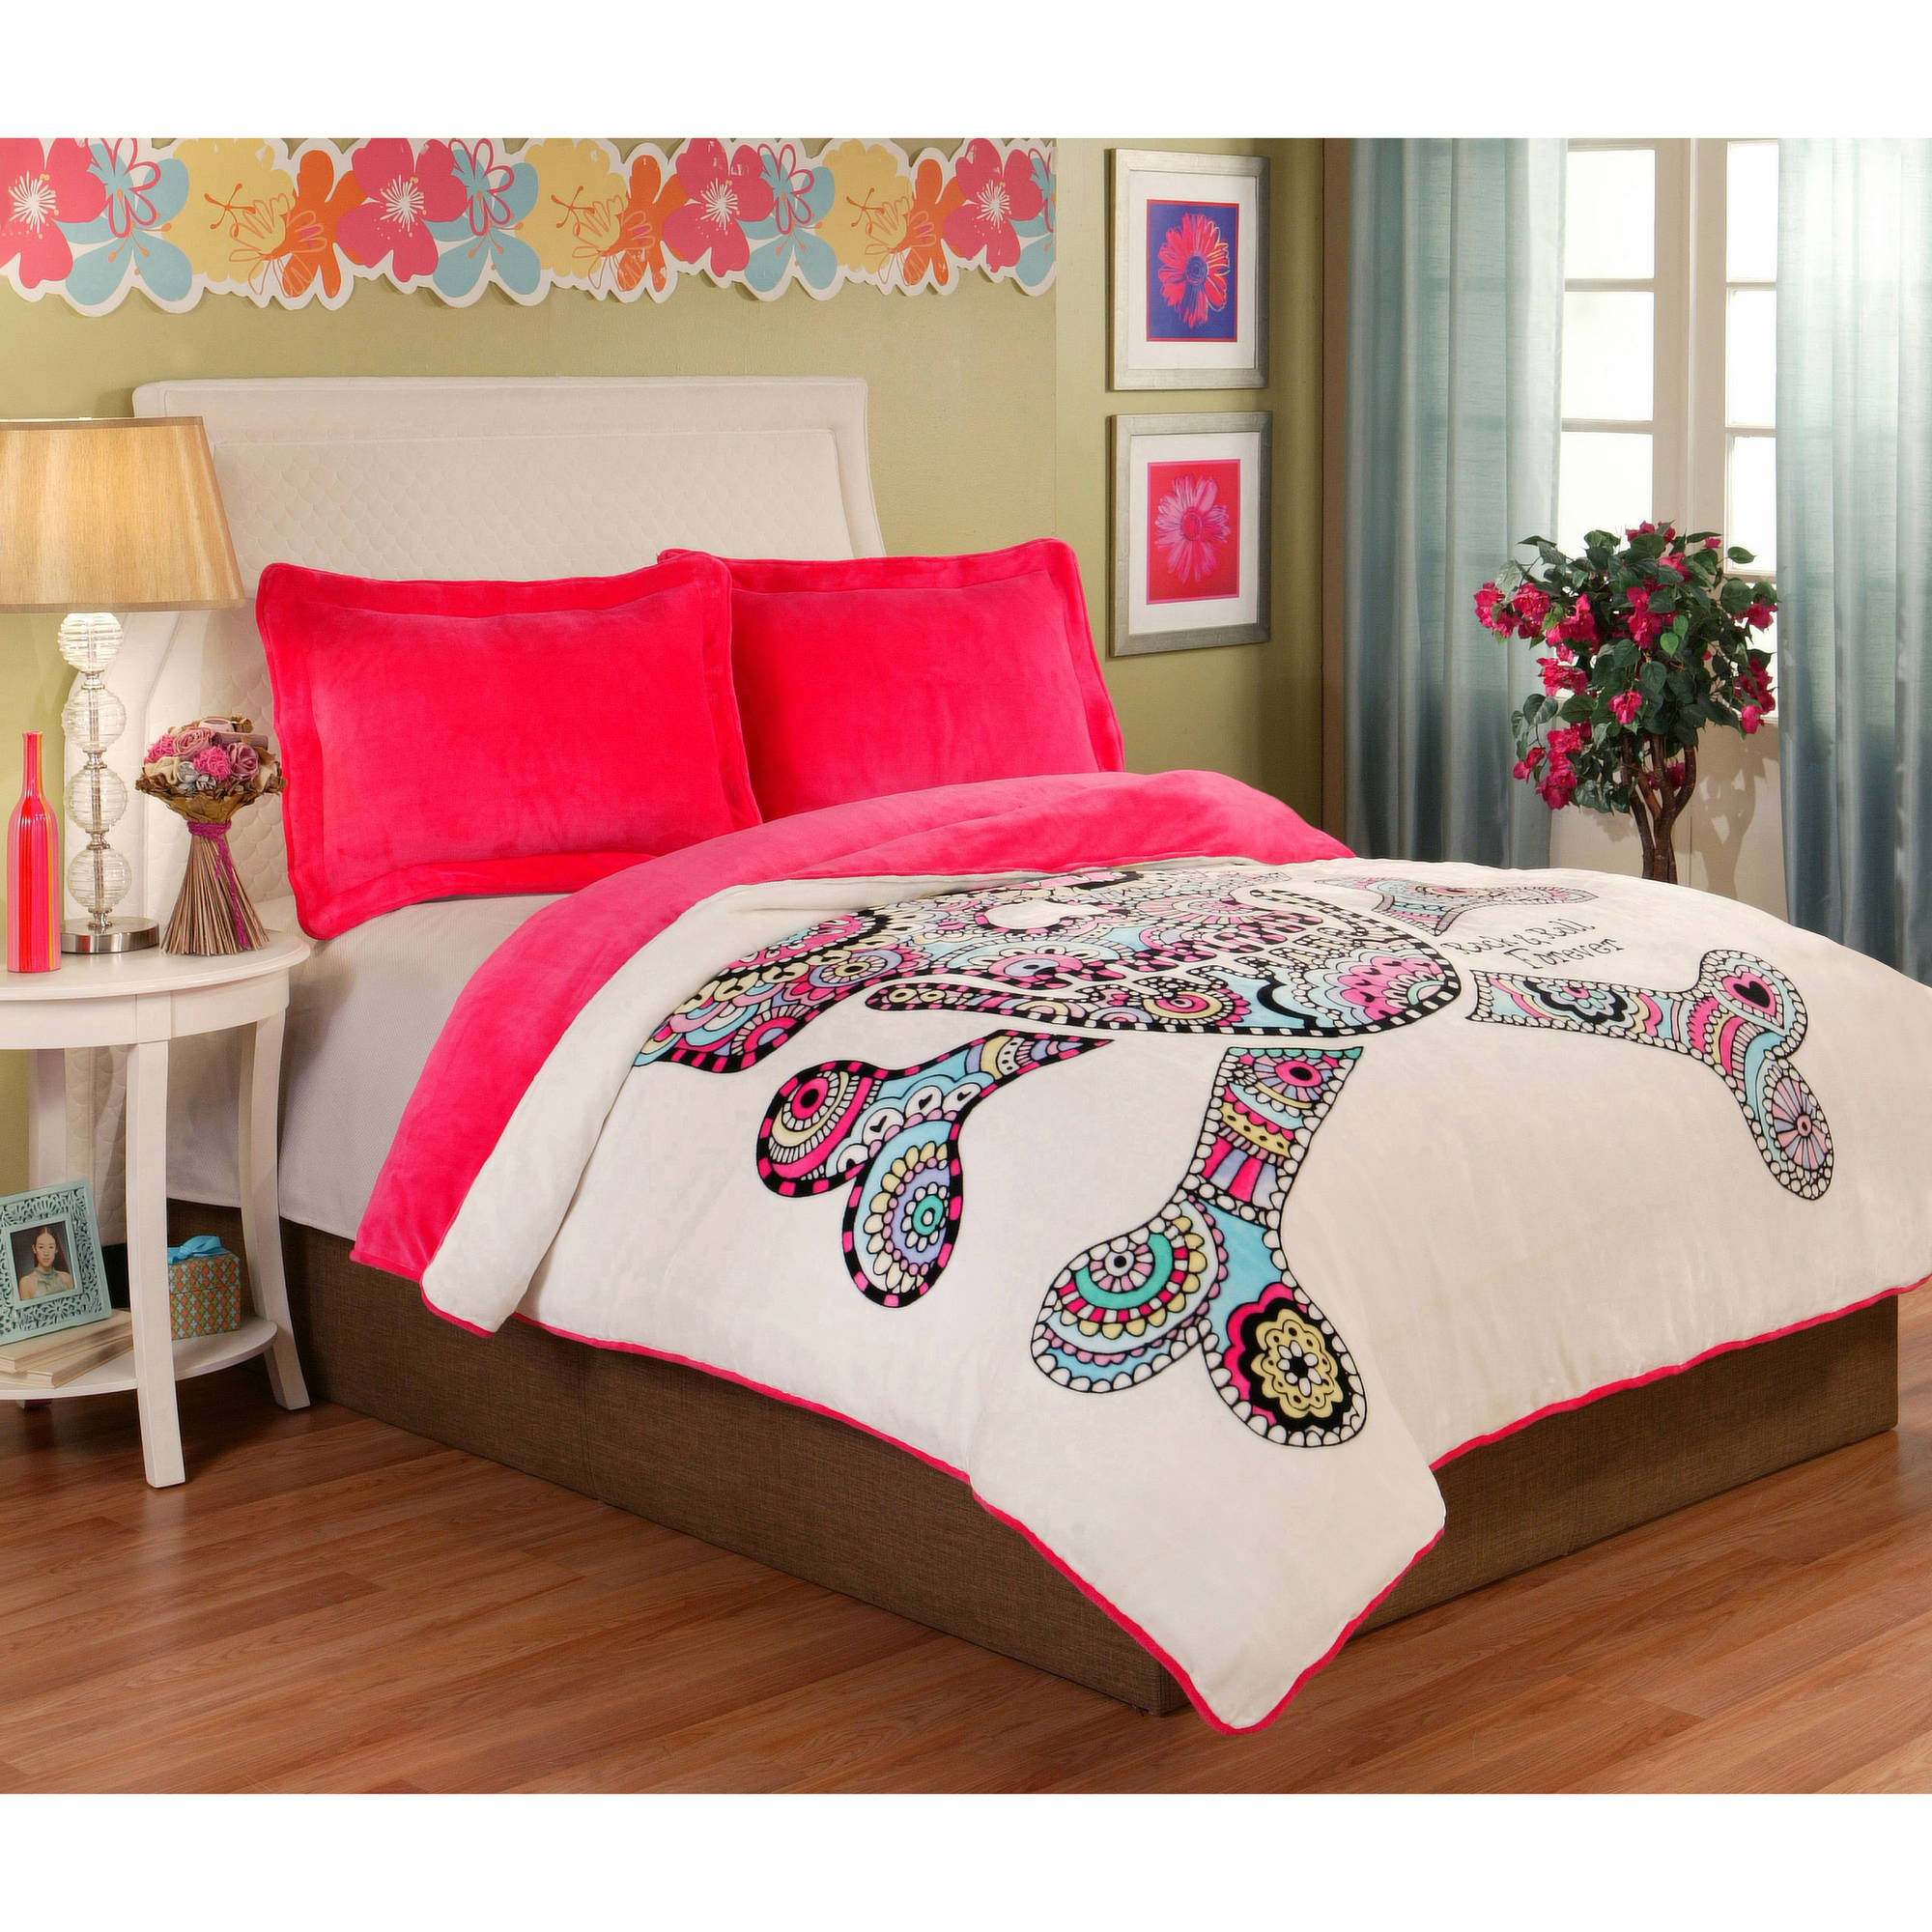 Generic Punk Love Velvet Plush Print Bedding Comforter Mini Set